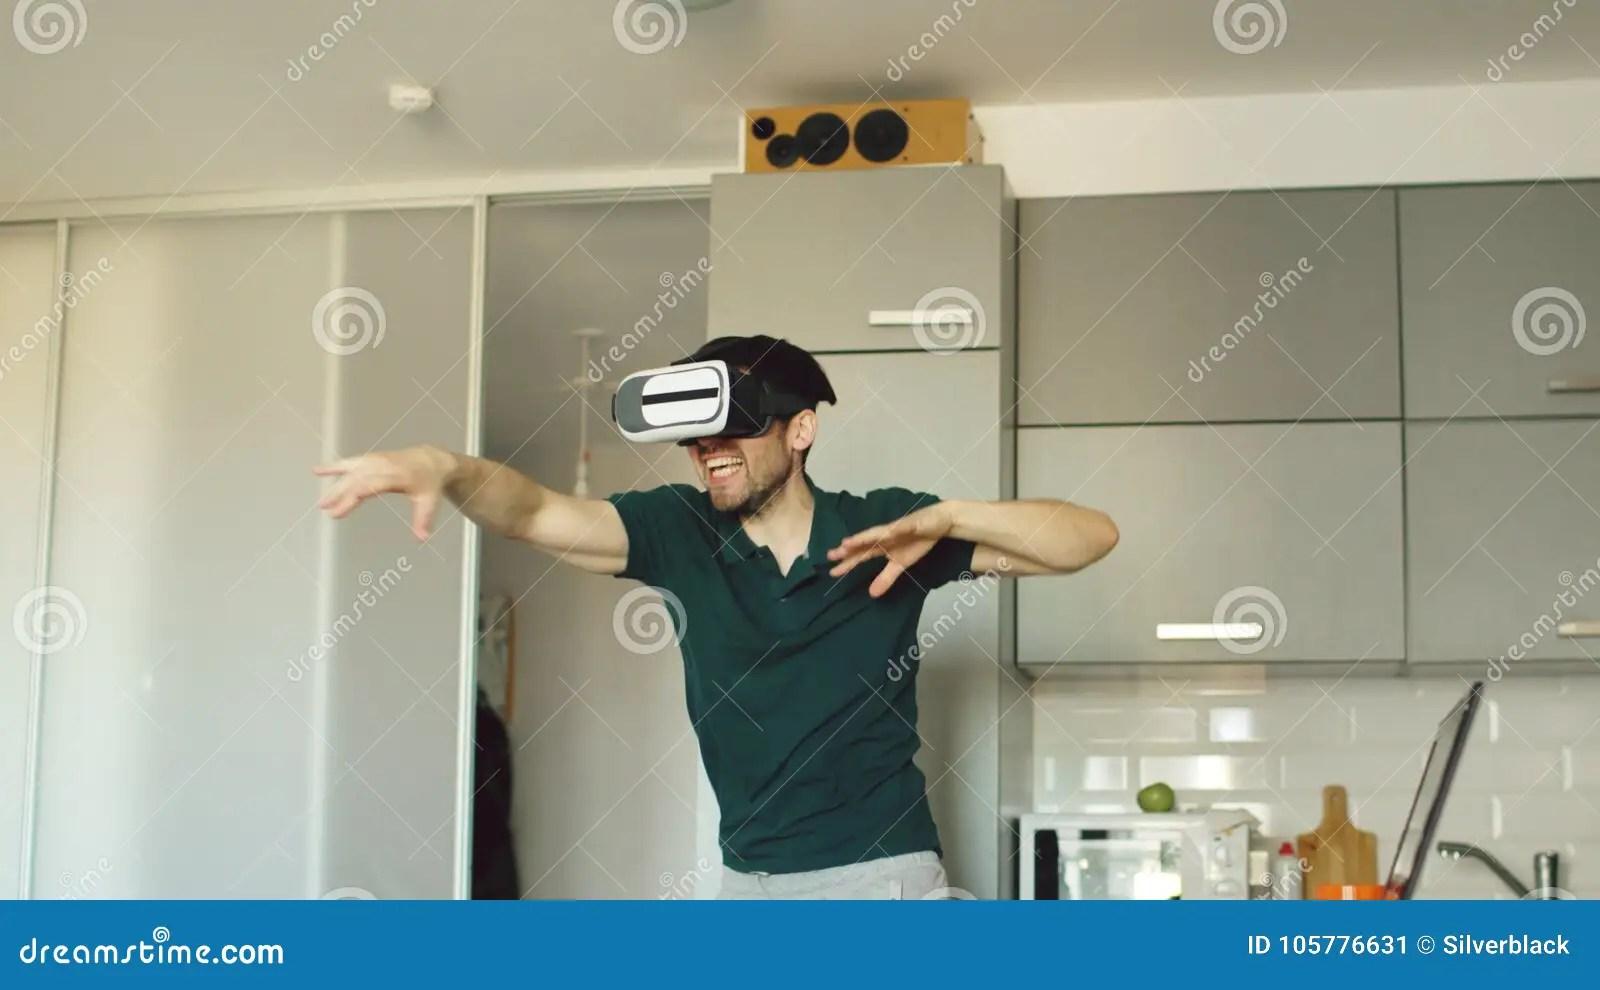 virtual kitchen single handle faucet with sprayer 虚拟现实360耳机跳舞的滑稽的年轻人在厨房早晨 当听到音乐时和获得乐趣 当听到音乐时和在家获得乐趣